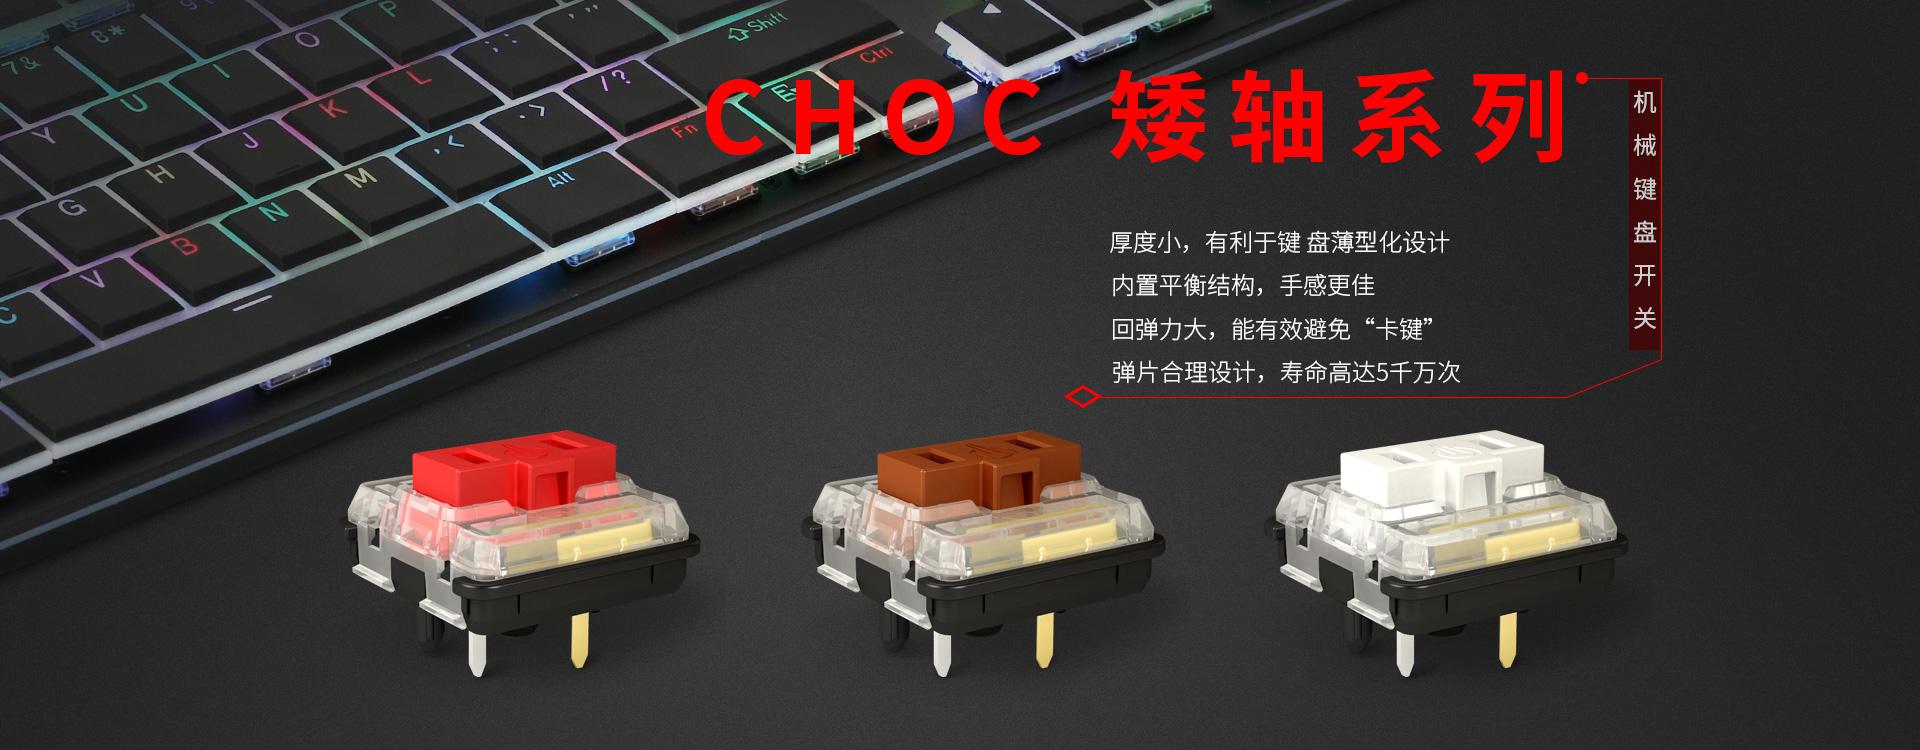 CHOC_V1